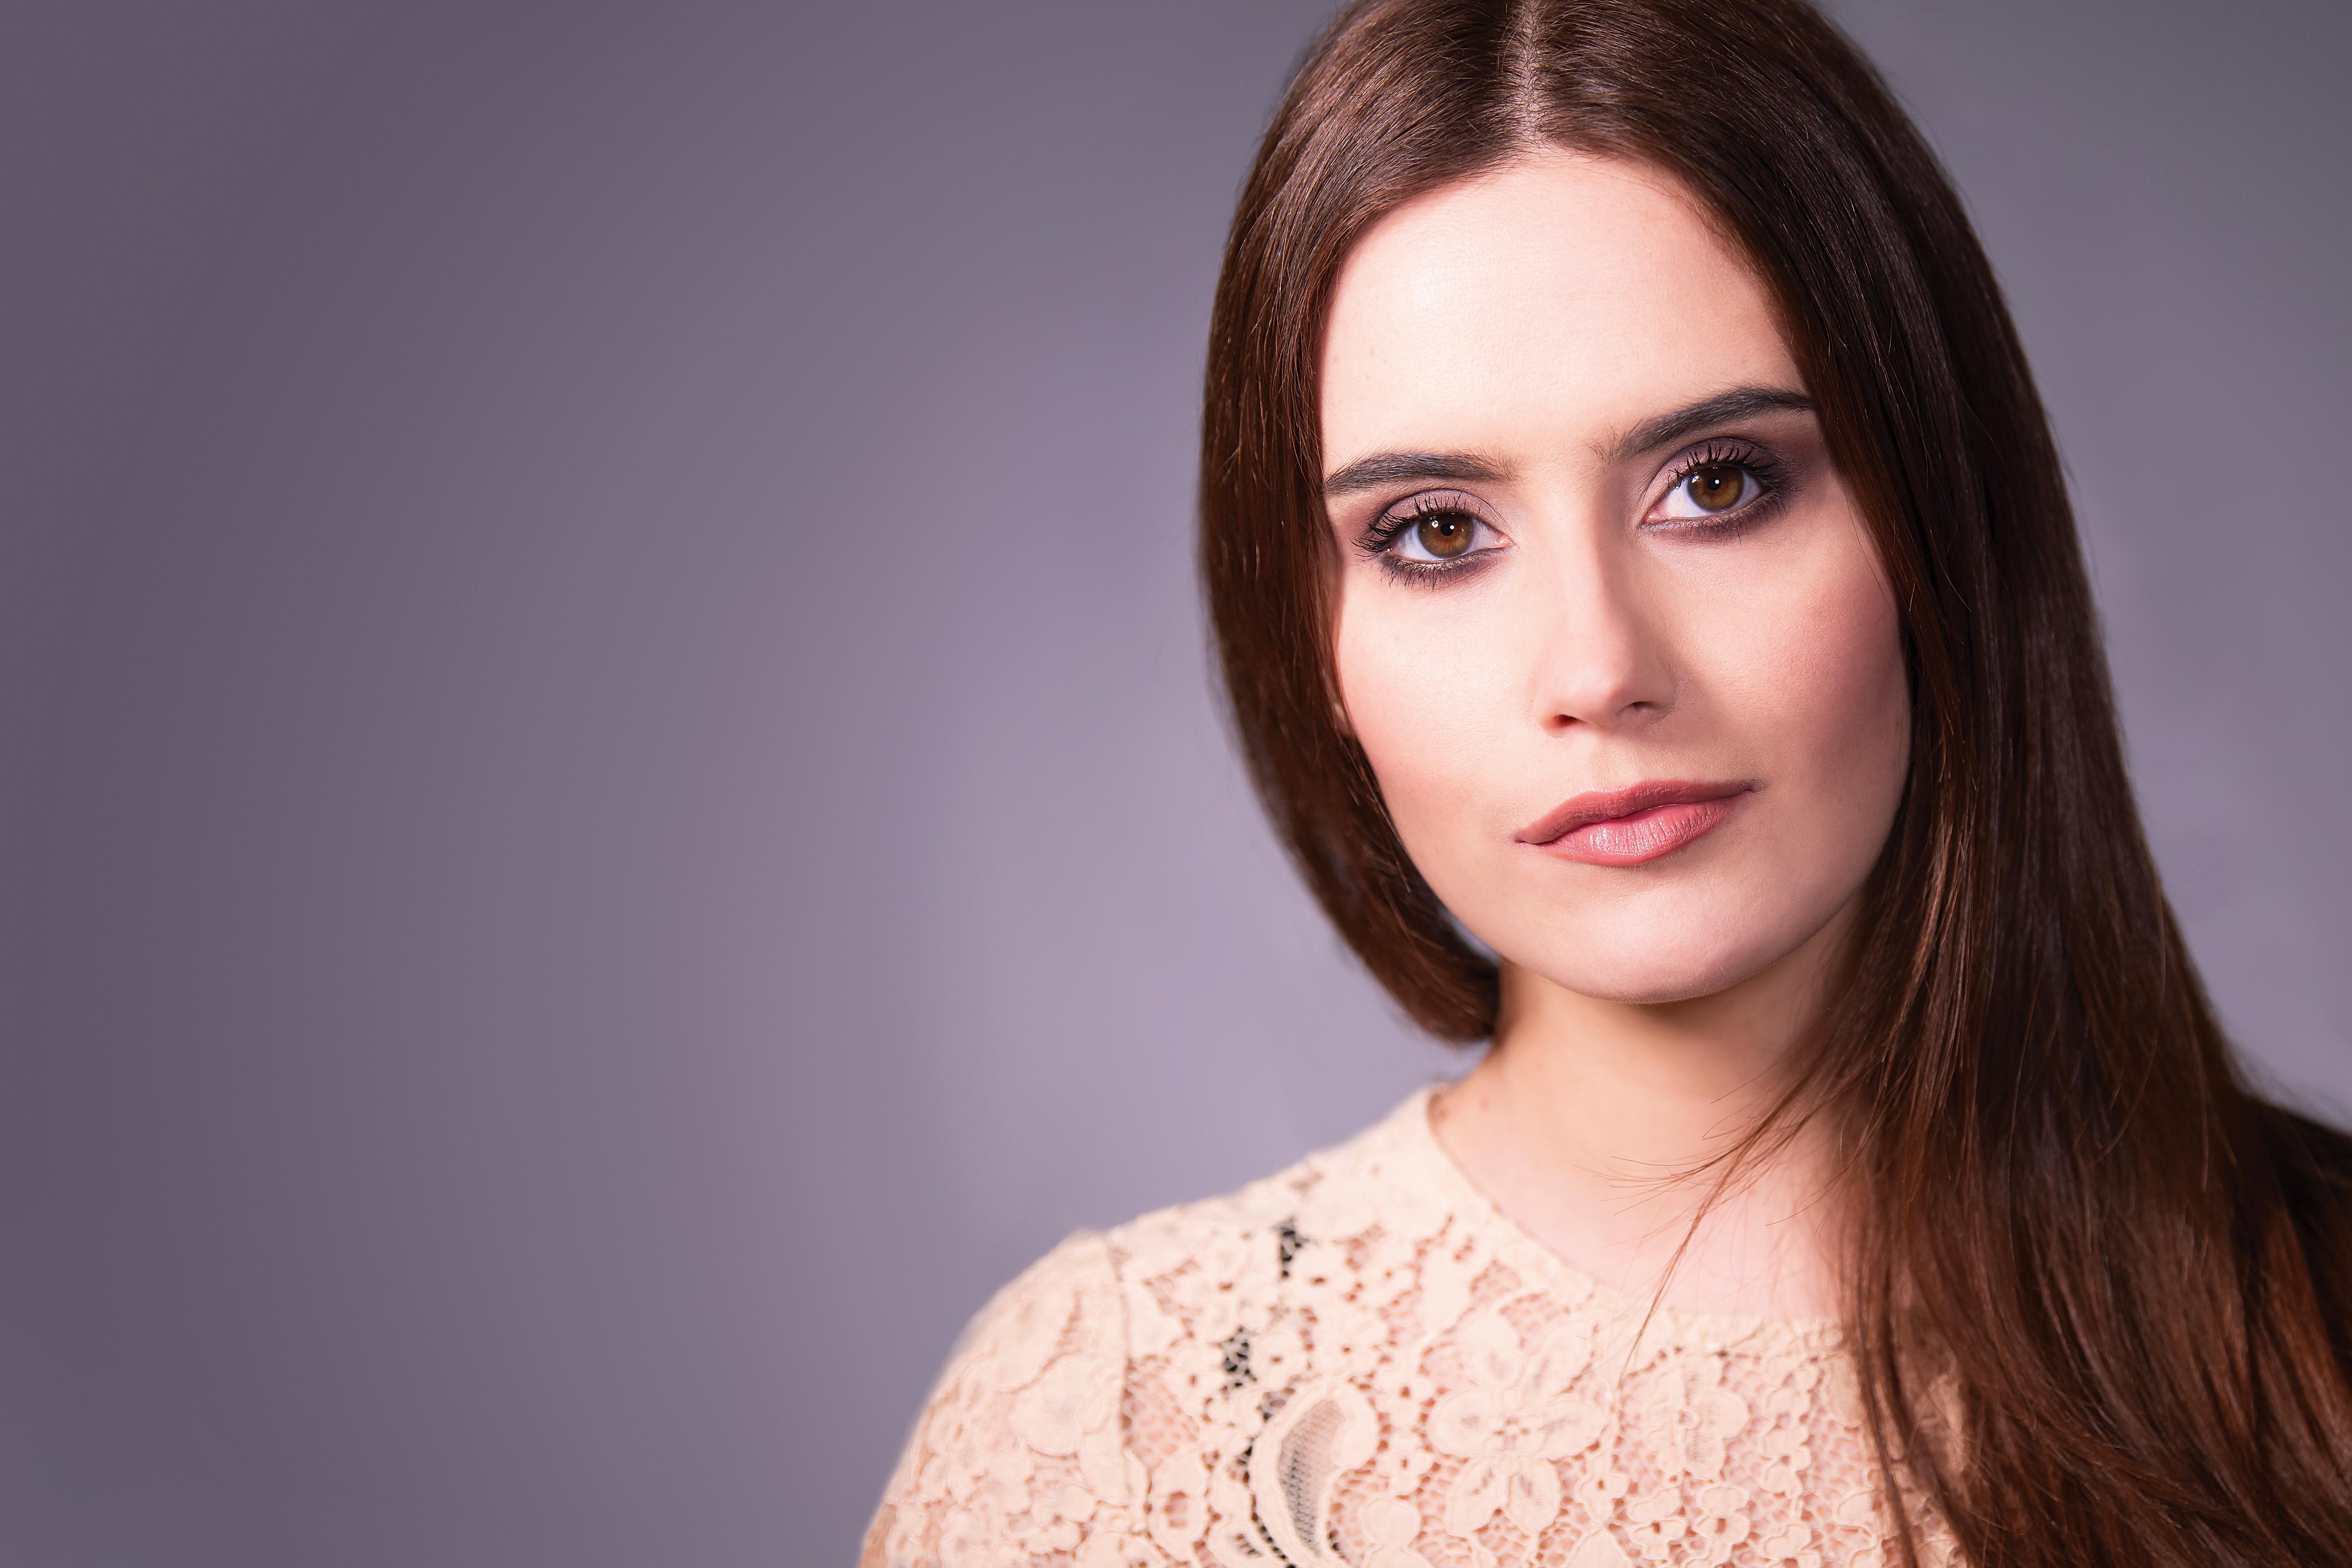 Portrait photography tips: Key lighting and fill lighting   Digital Camera World